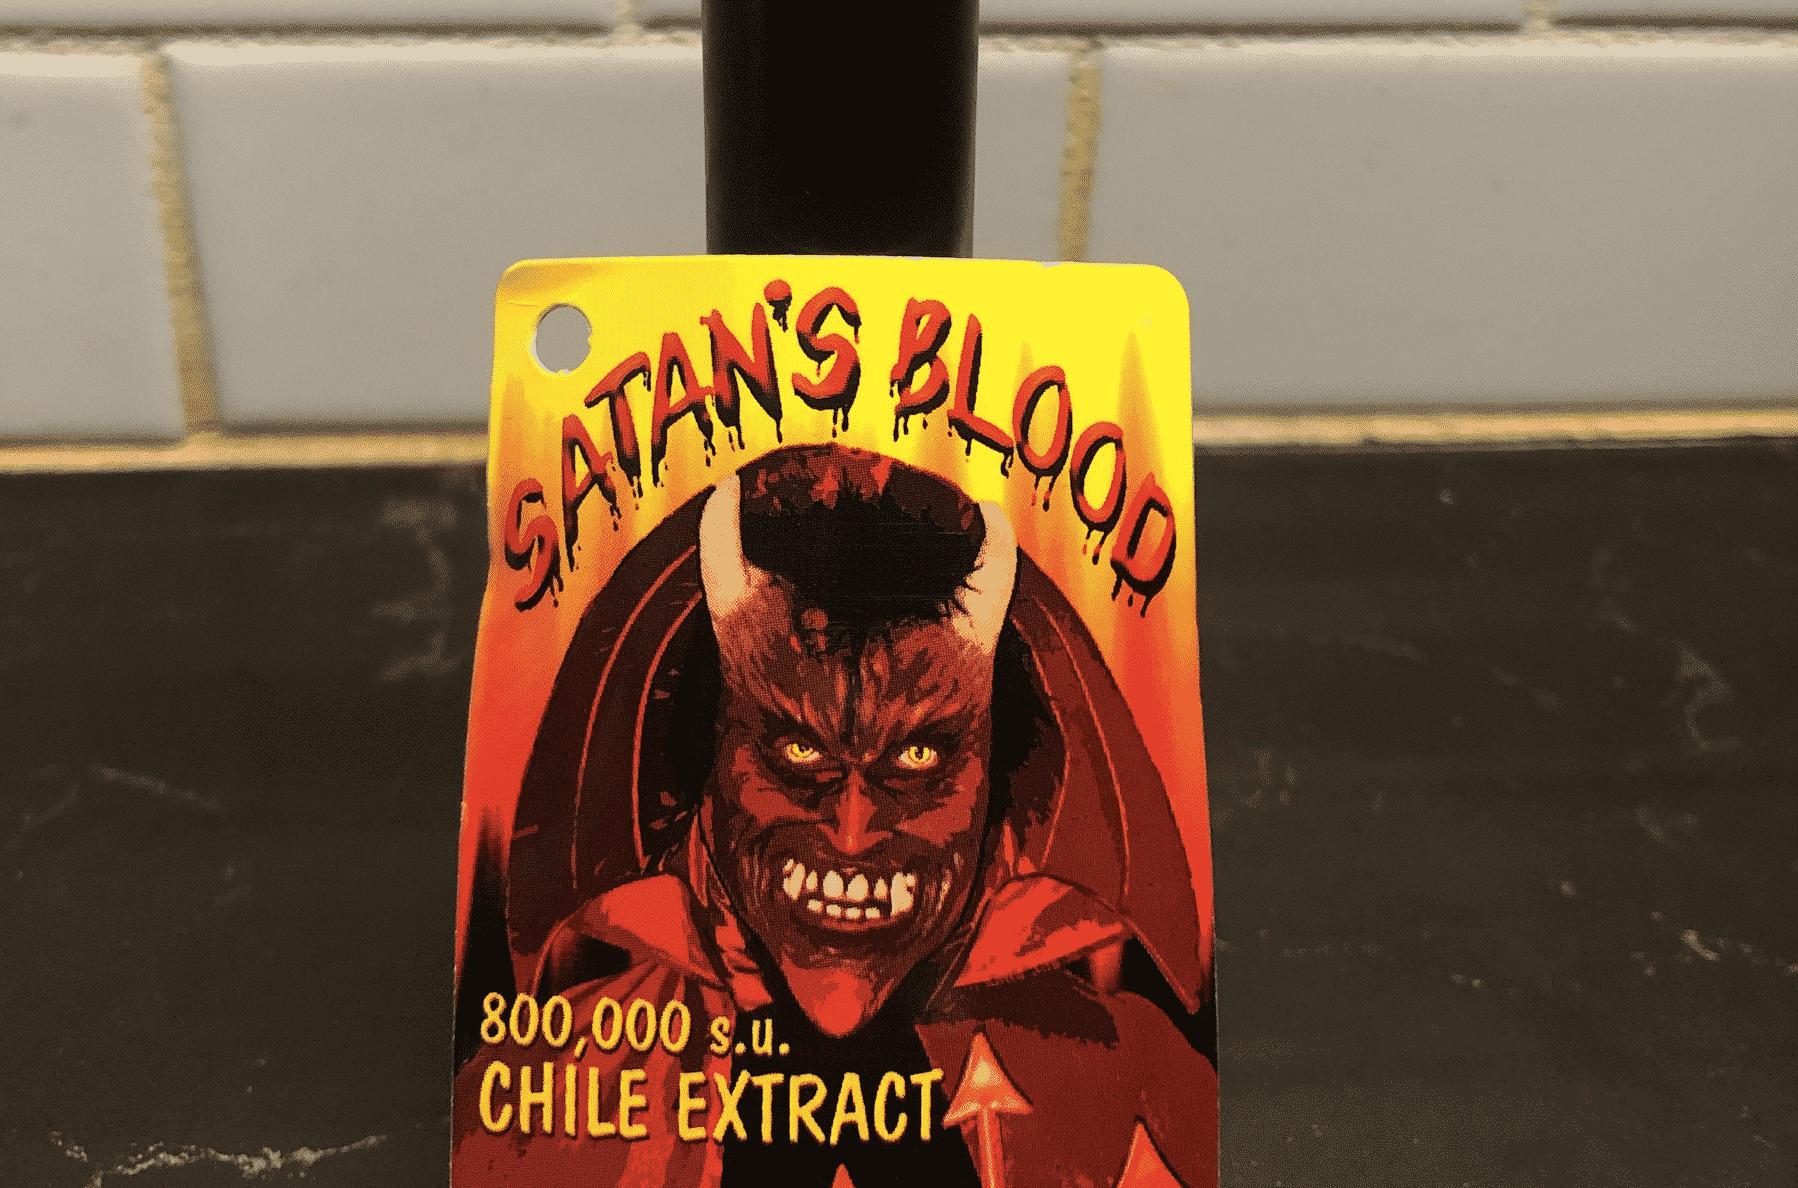 Satan's Blood Hot Sauce Label